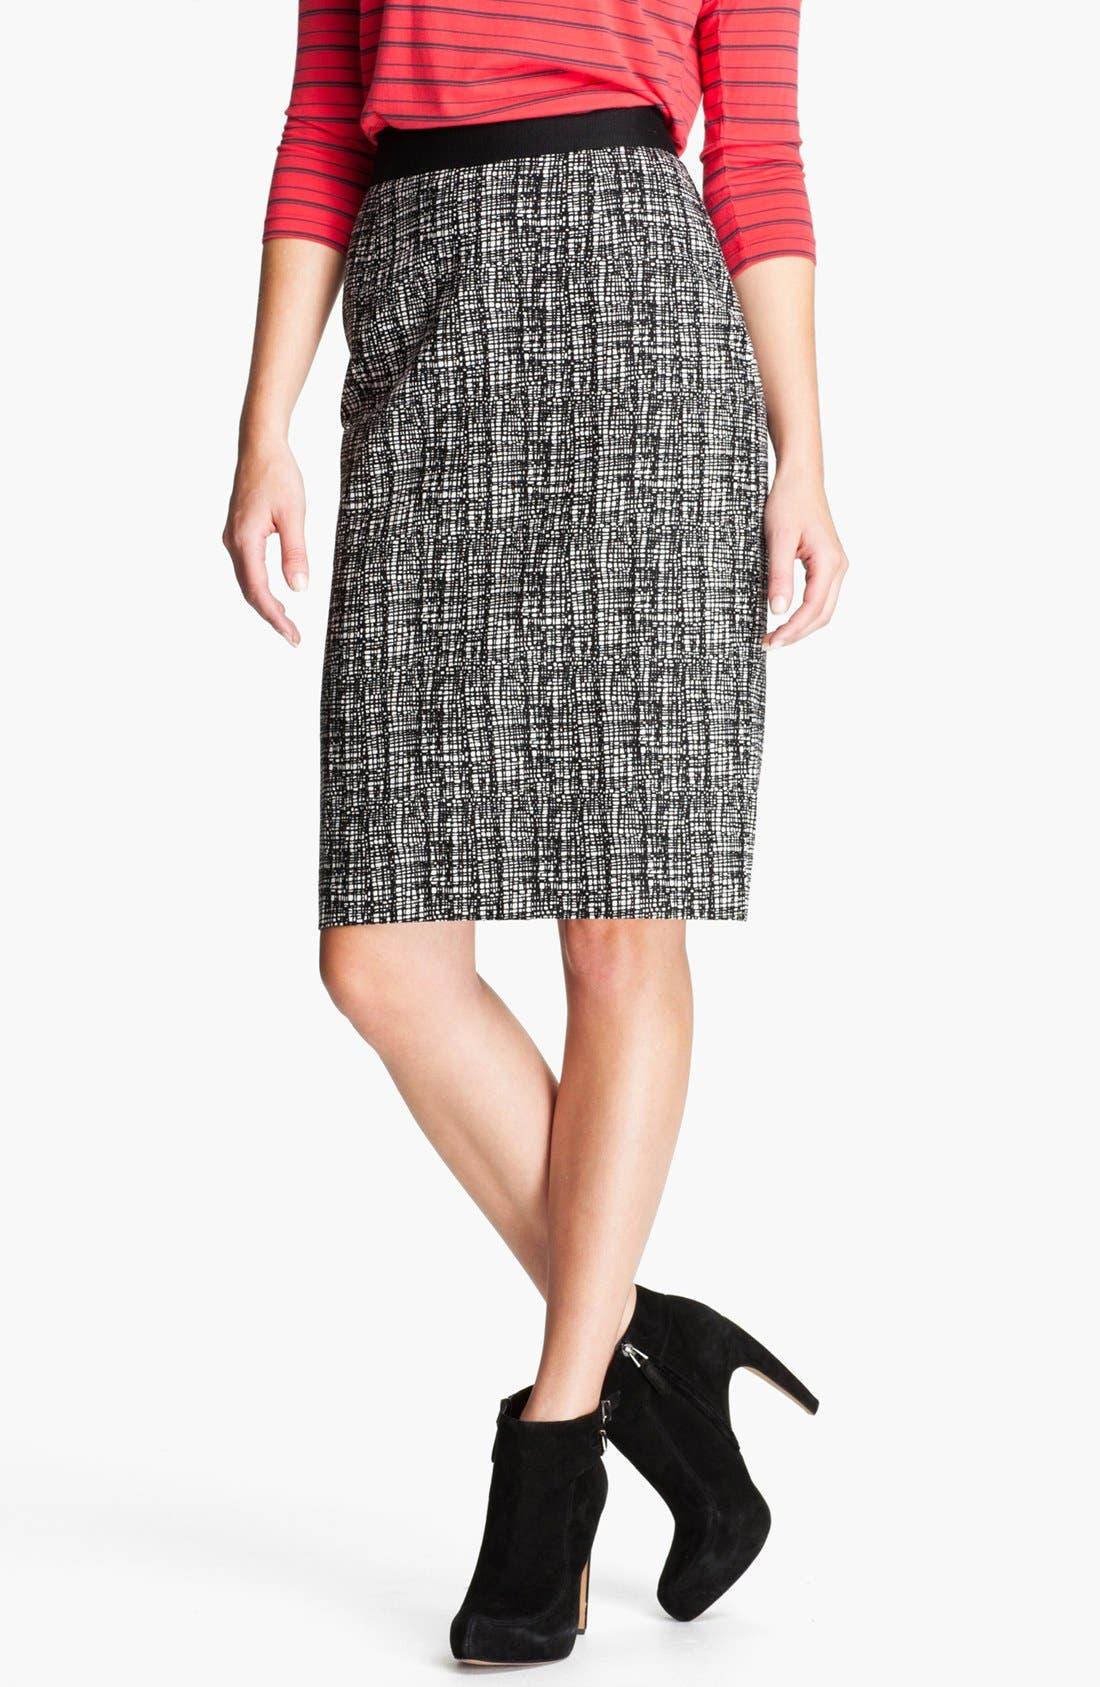 Alternate Image 1 Selected - Halogen® Patterned Pencil Skirt (Petite)